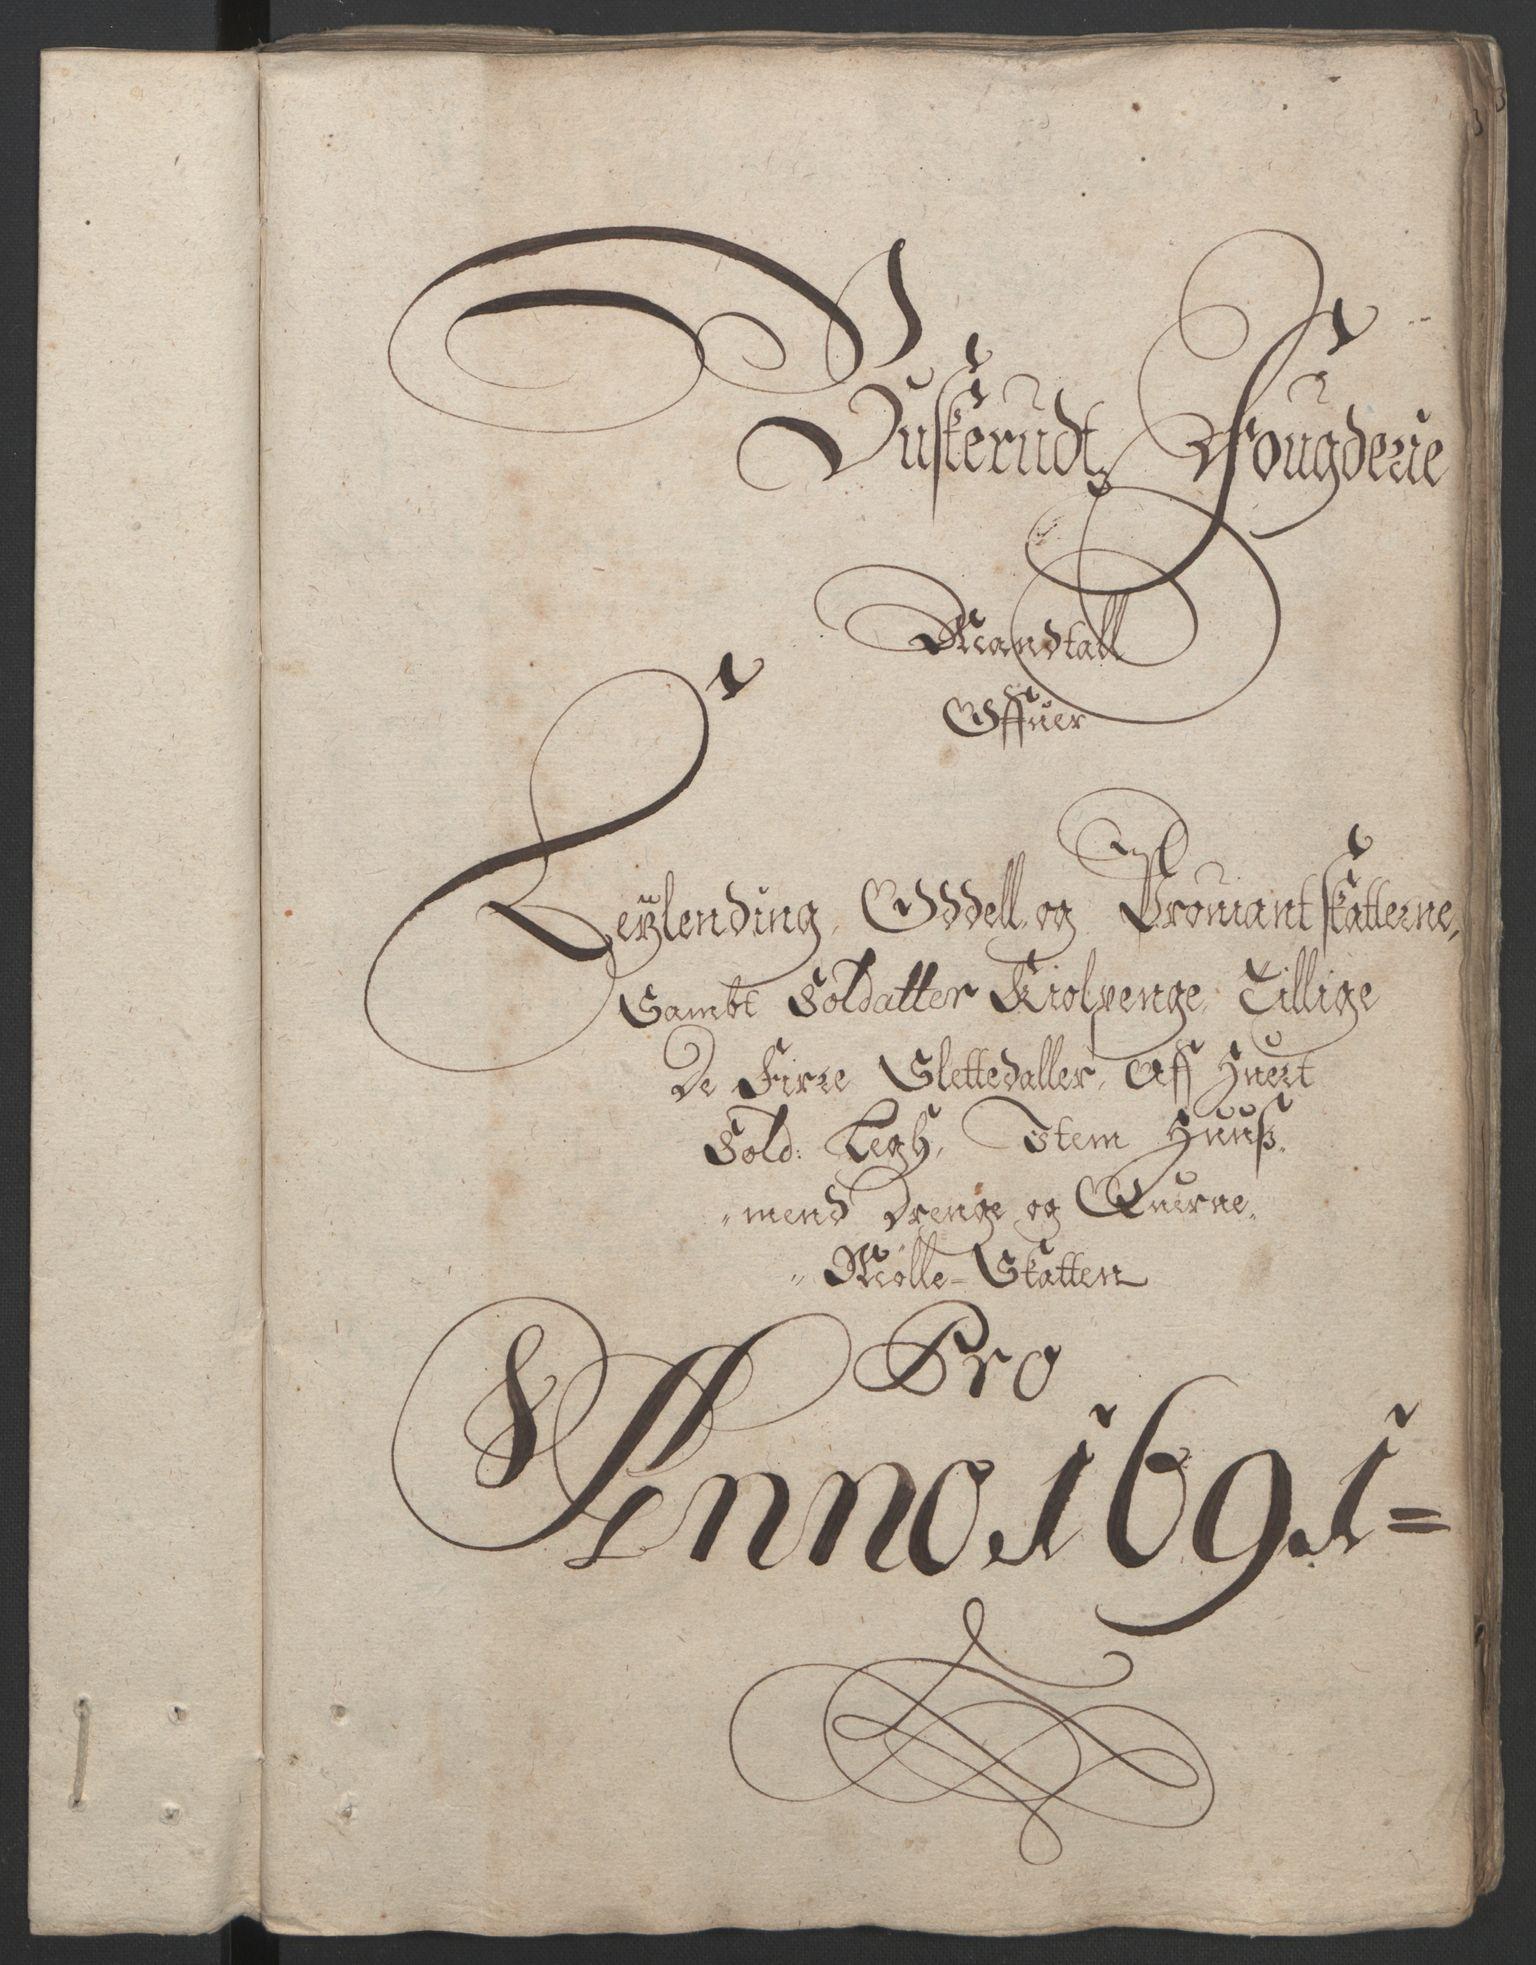 RA, Rentekammeret inntil 1814, Reviderte regnskaper, Fogderegnskap, R25/L1681: Fogderegnskap Buskerud, 1691-1692, s. 102